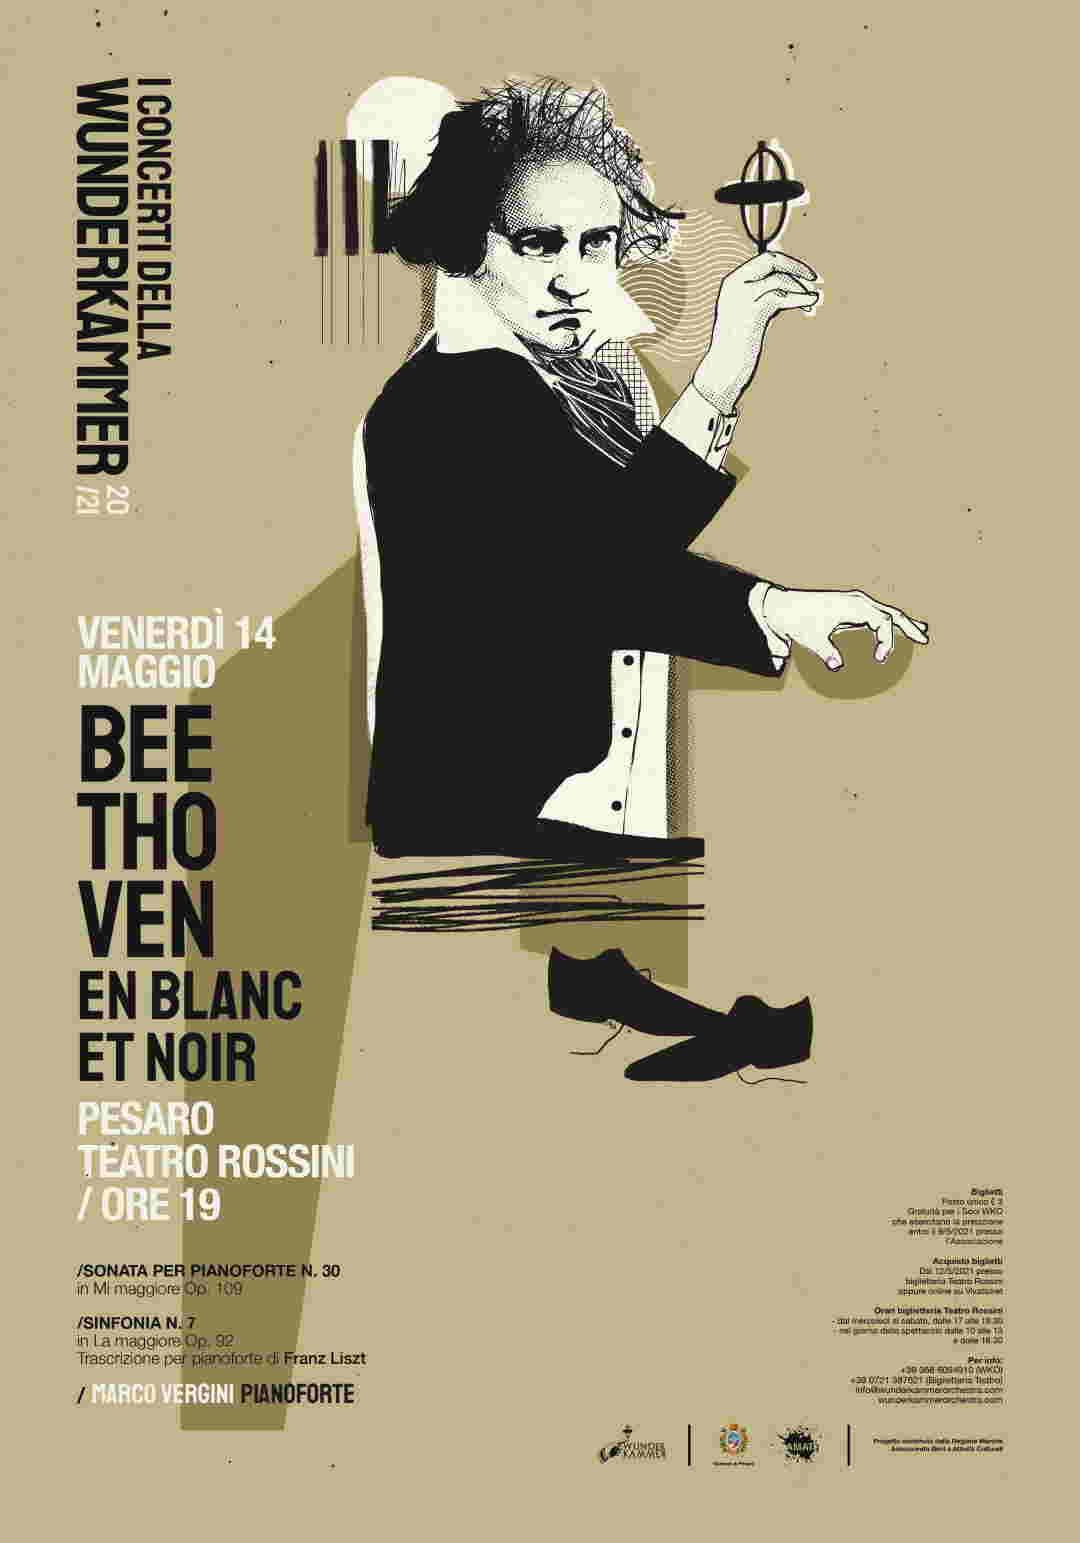 Beethoven in Bianco e Nero